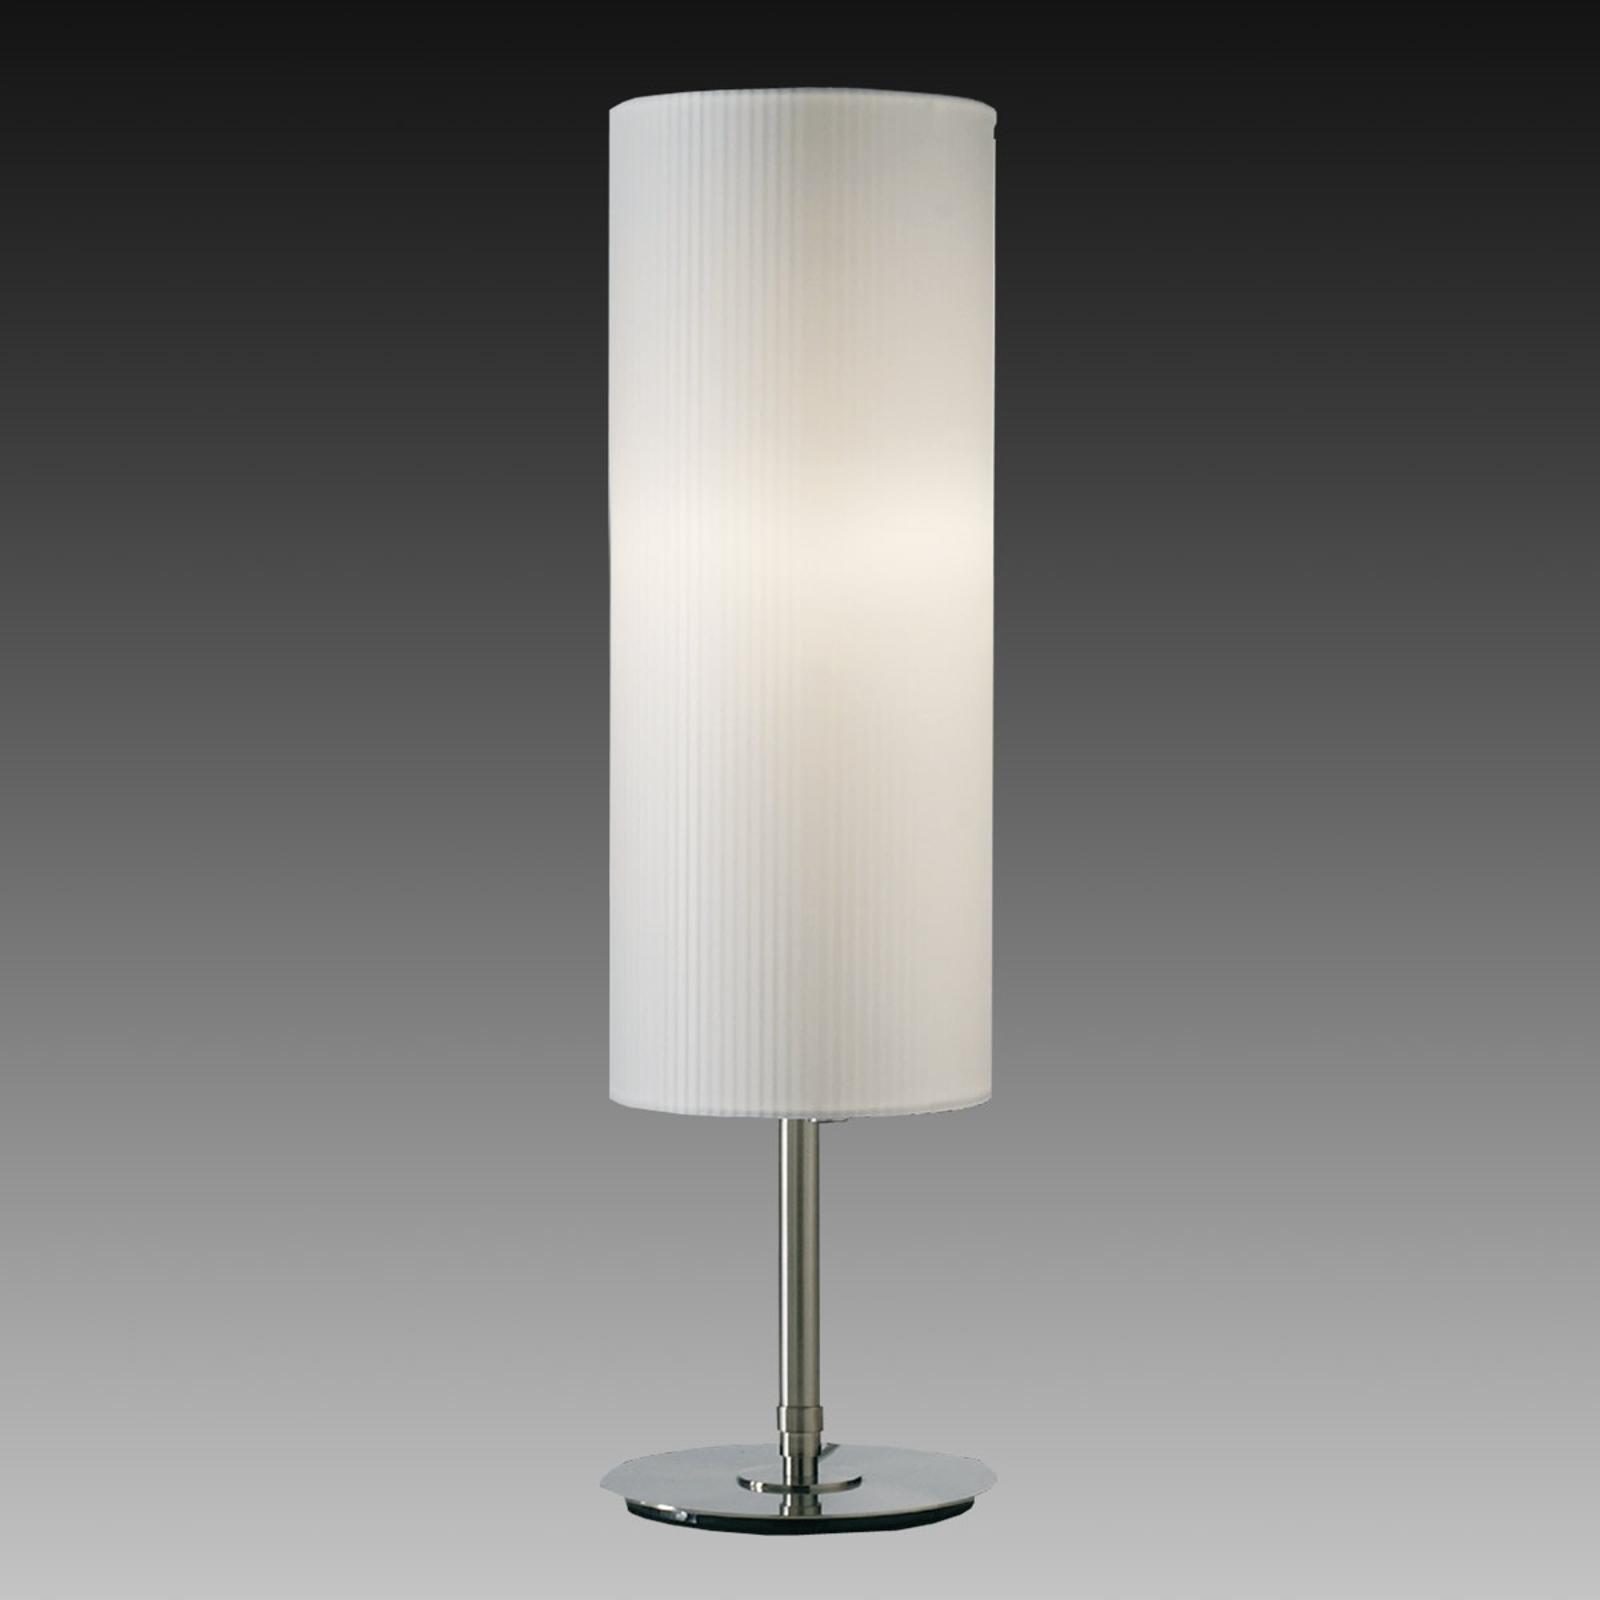 Duża lampa stołowa BENITO, 76 cm